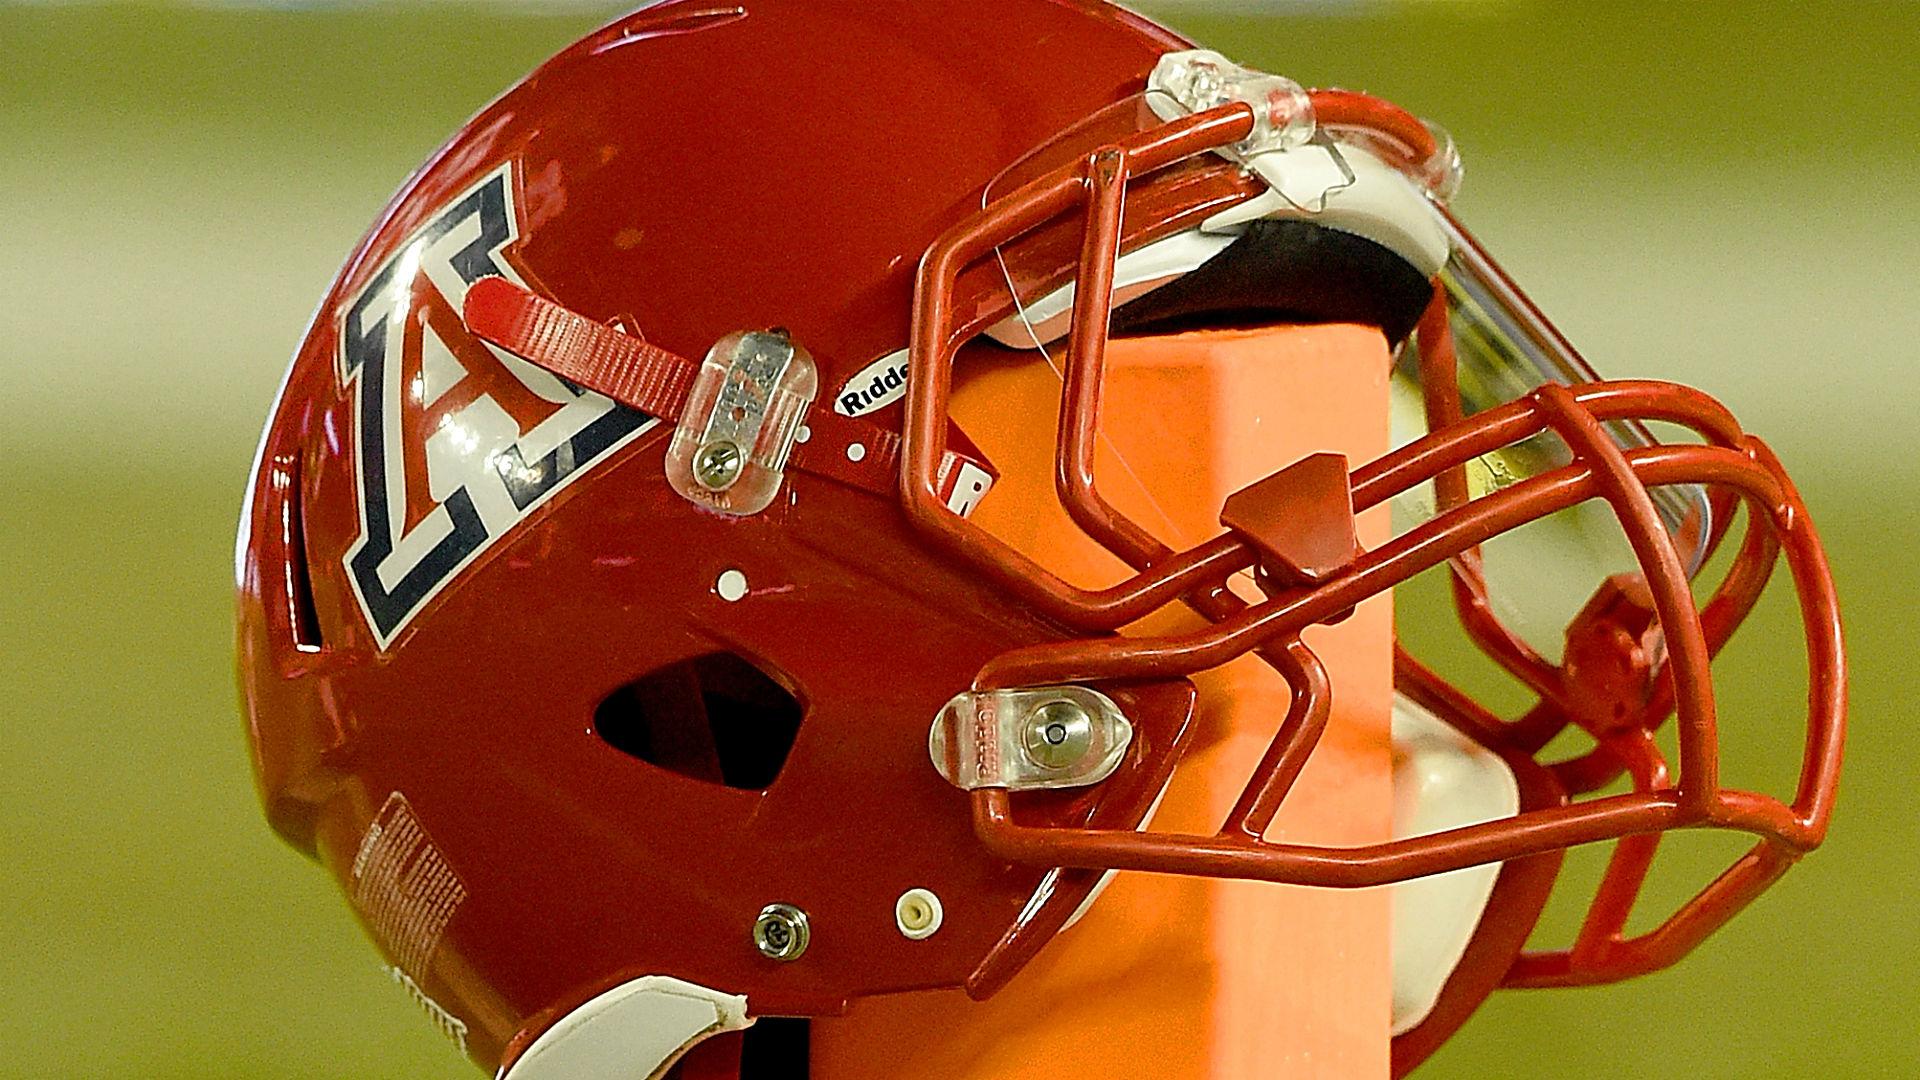 Arizona-wildcats-helmet-8816-usnews-getty-ftr_1hmtnhv4rbzdi18dv8k4eoznc4